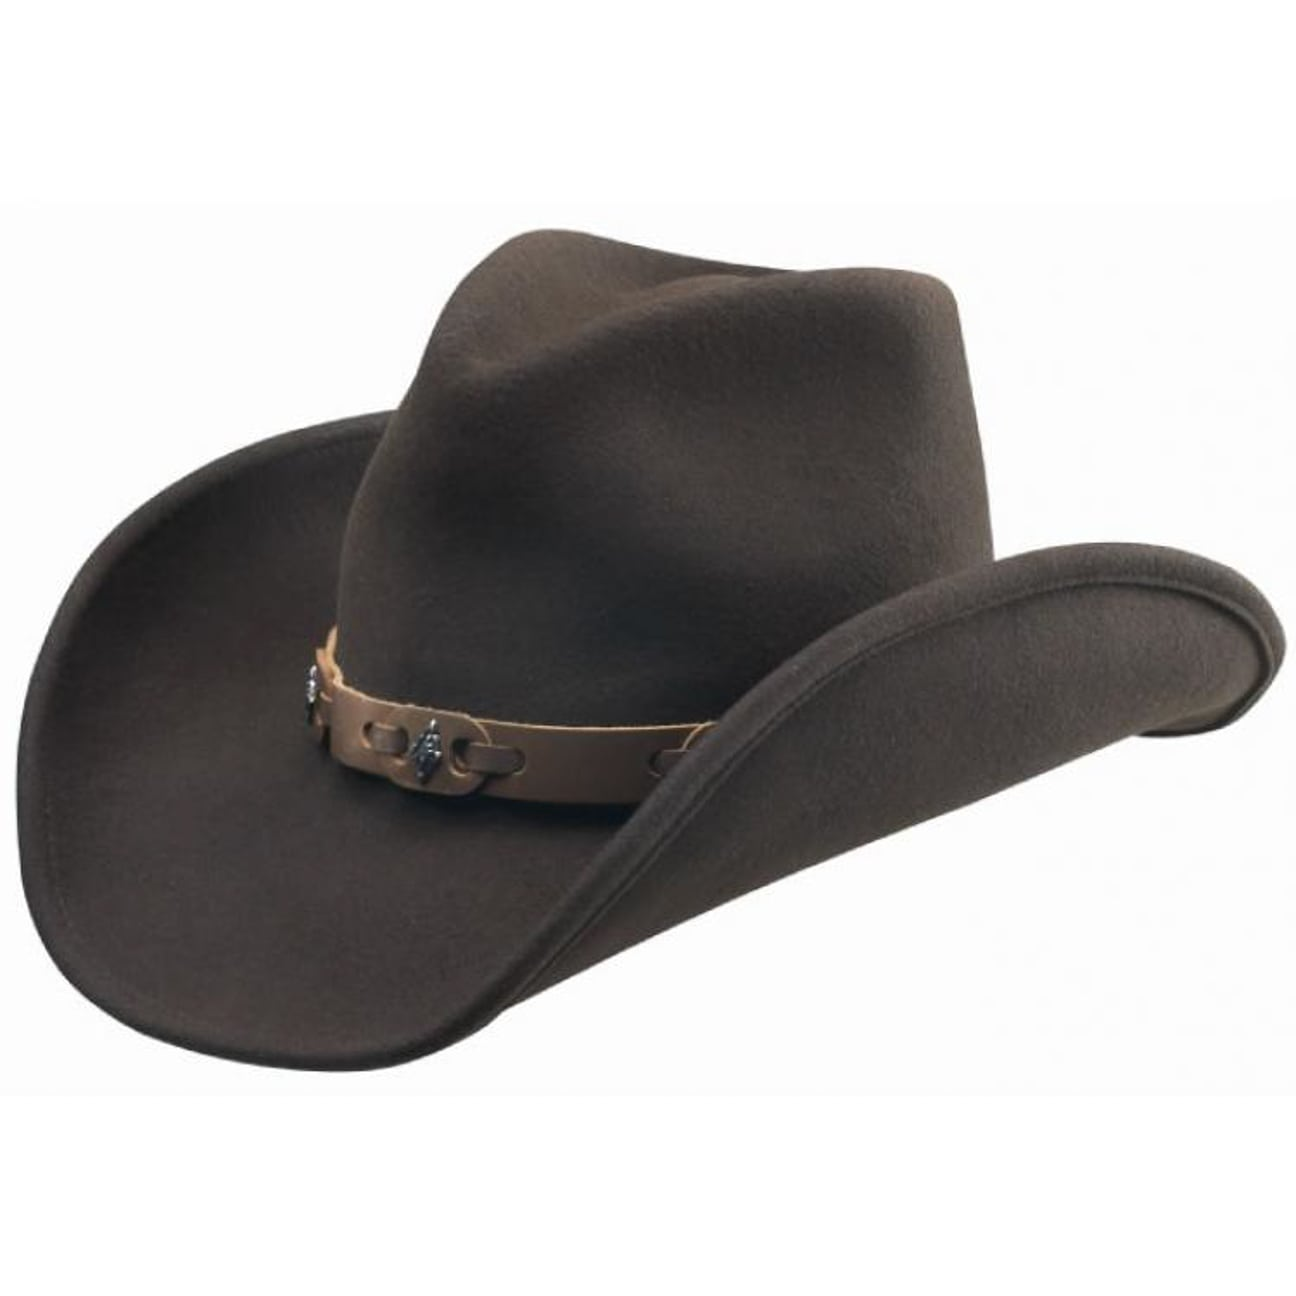 ... Bolton Cappello VitaFelt Cowboy by Stetson - marrone 1 7014e317200